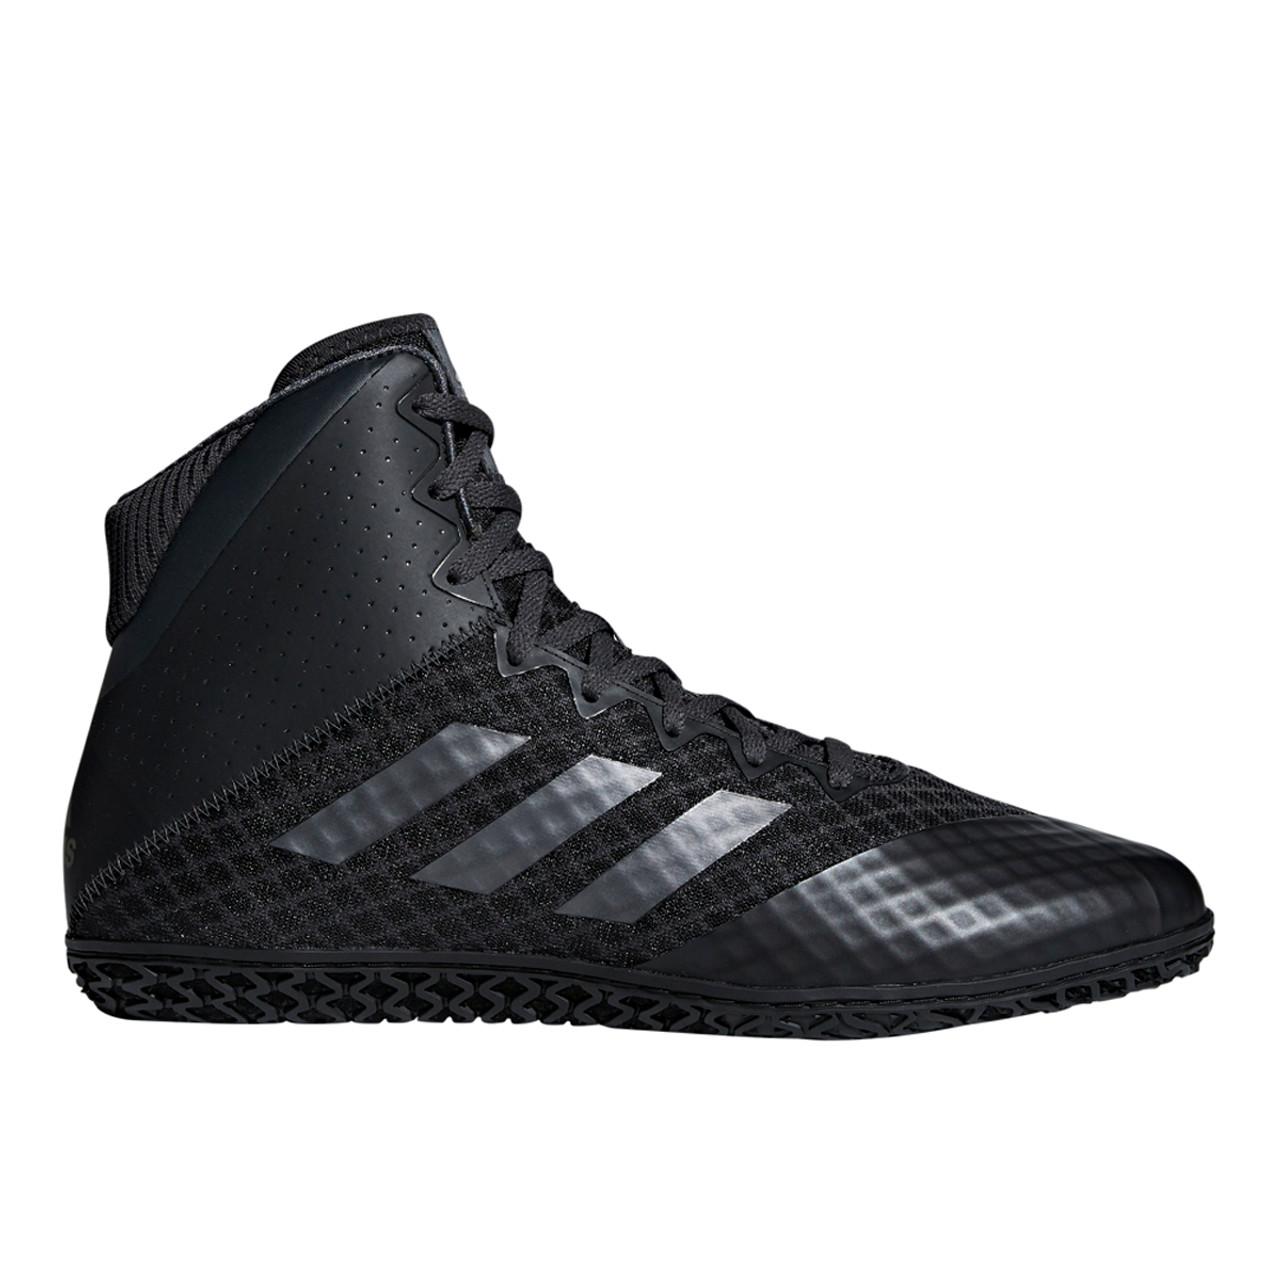 b3c6cac7 Adidas Mat Wizard 4 Men's Wrestling Shoes AC6971 - Carbon, Black